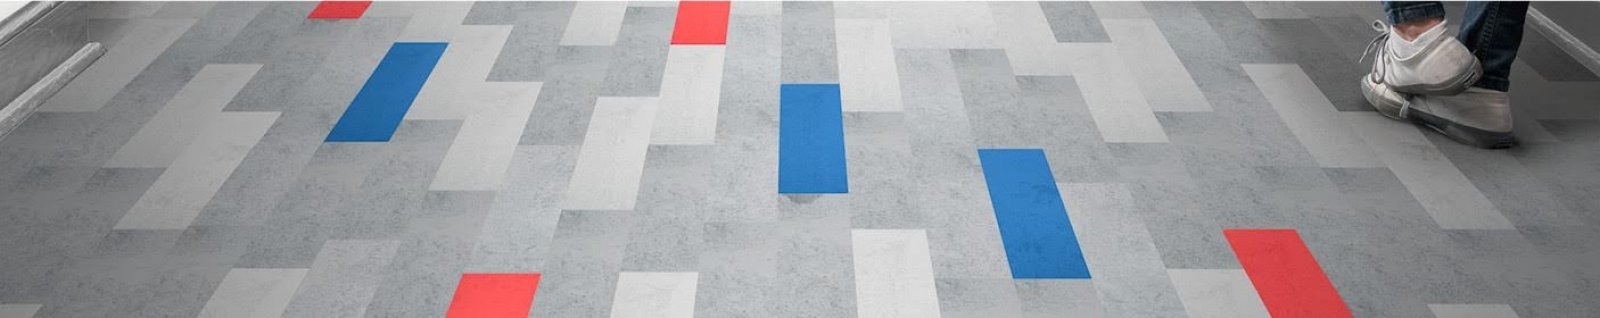 Rubber Sheet Tile Hard Surface Mannington Commercial